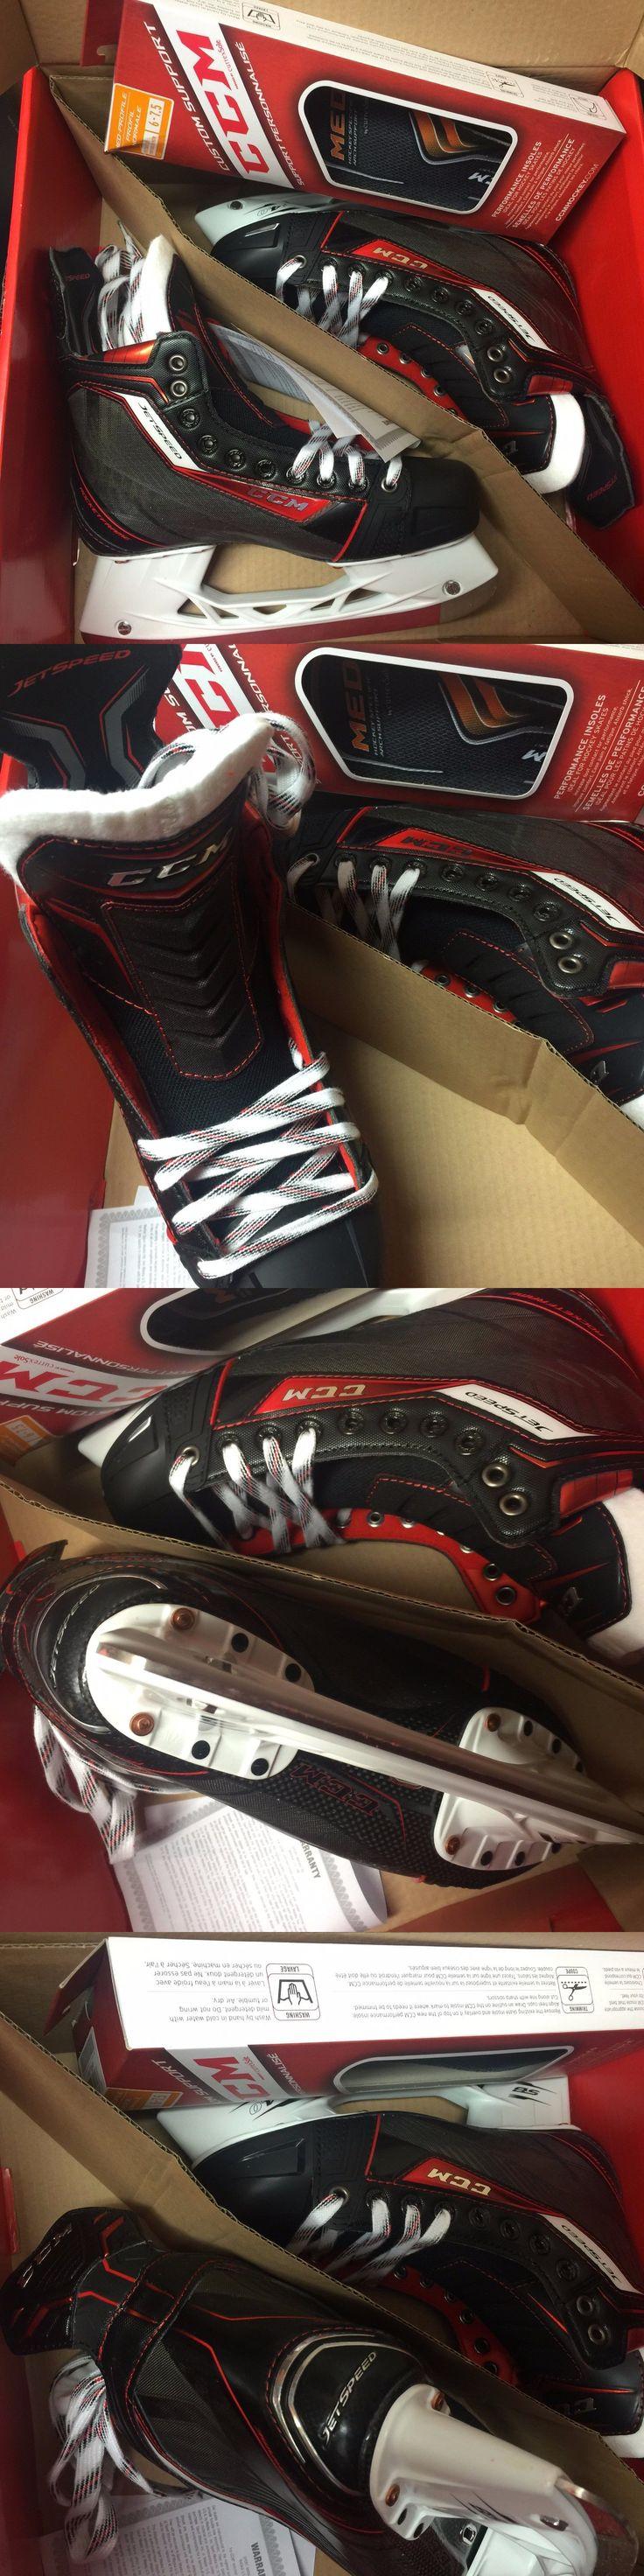 Ice Hockey-Adult 20858: Ccm Jetspeed Senior Ice Hockey Skates BUY IT NOW ONLY: $499.95